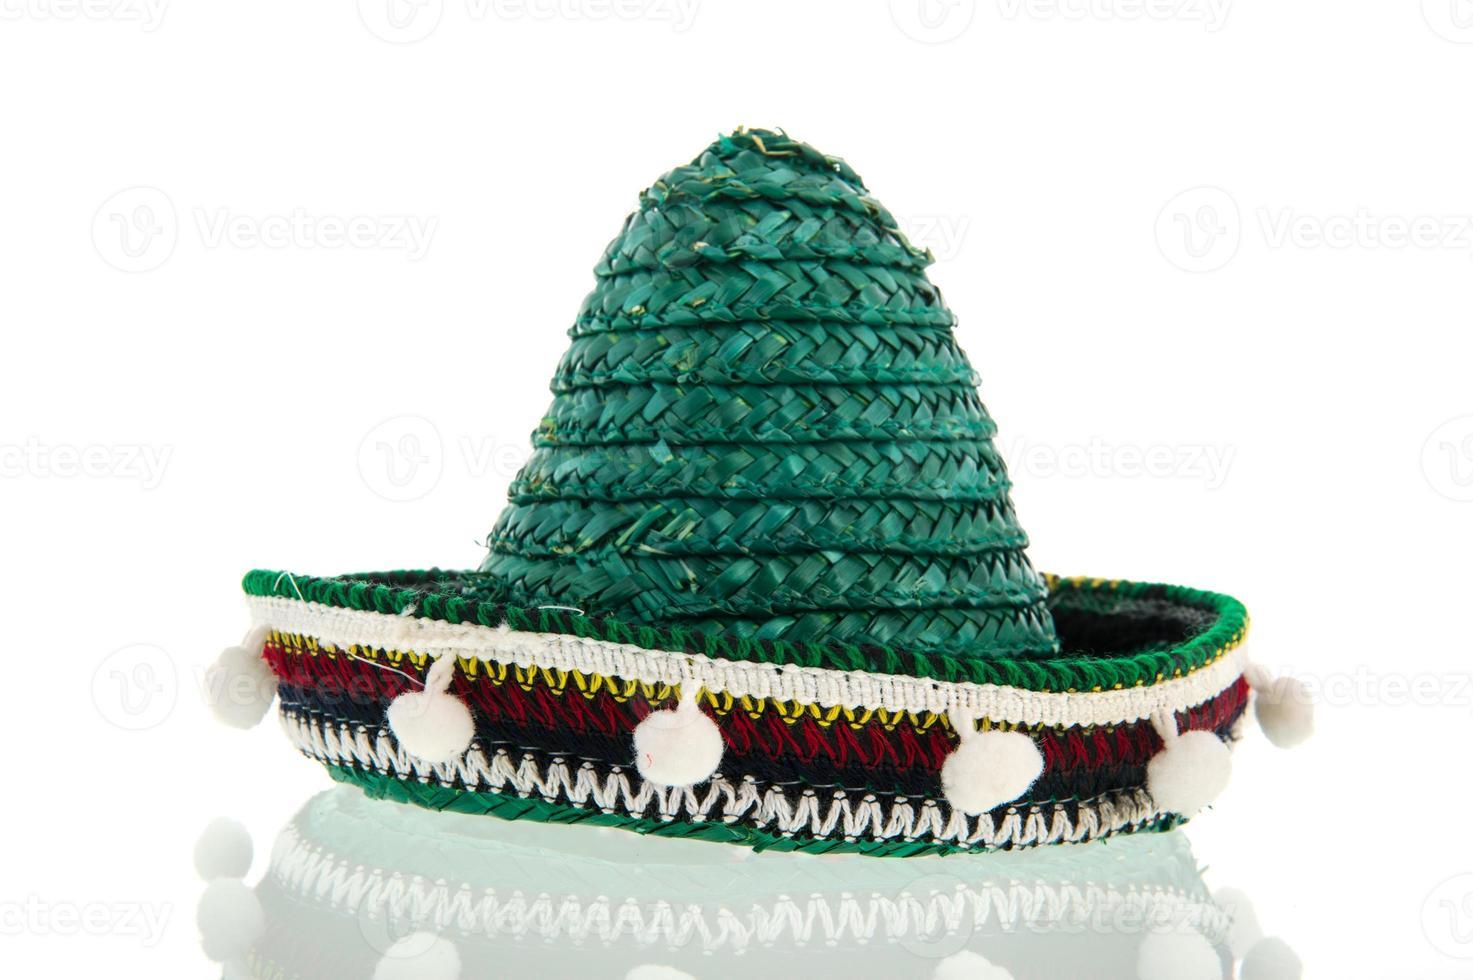 Green Sombrero photo